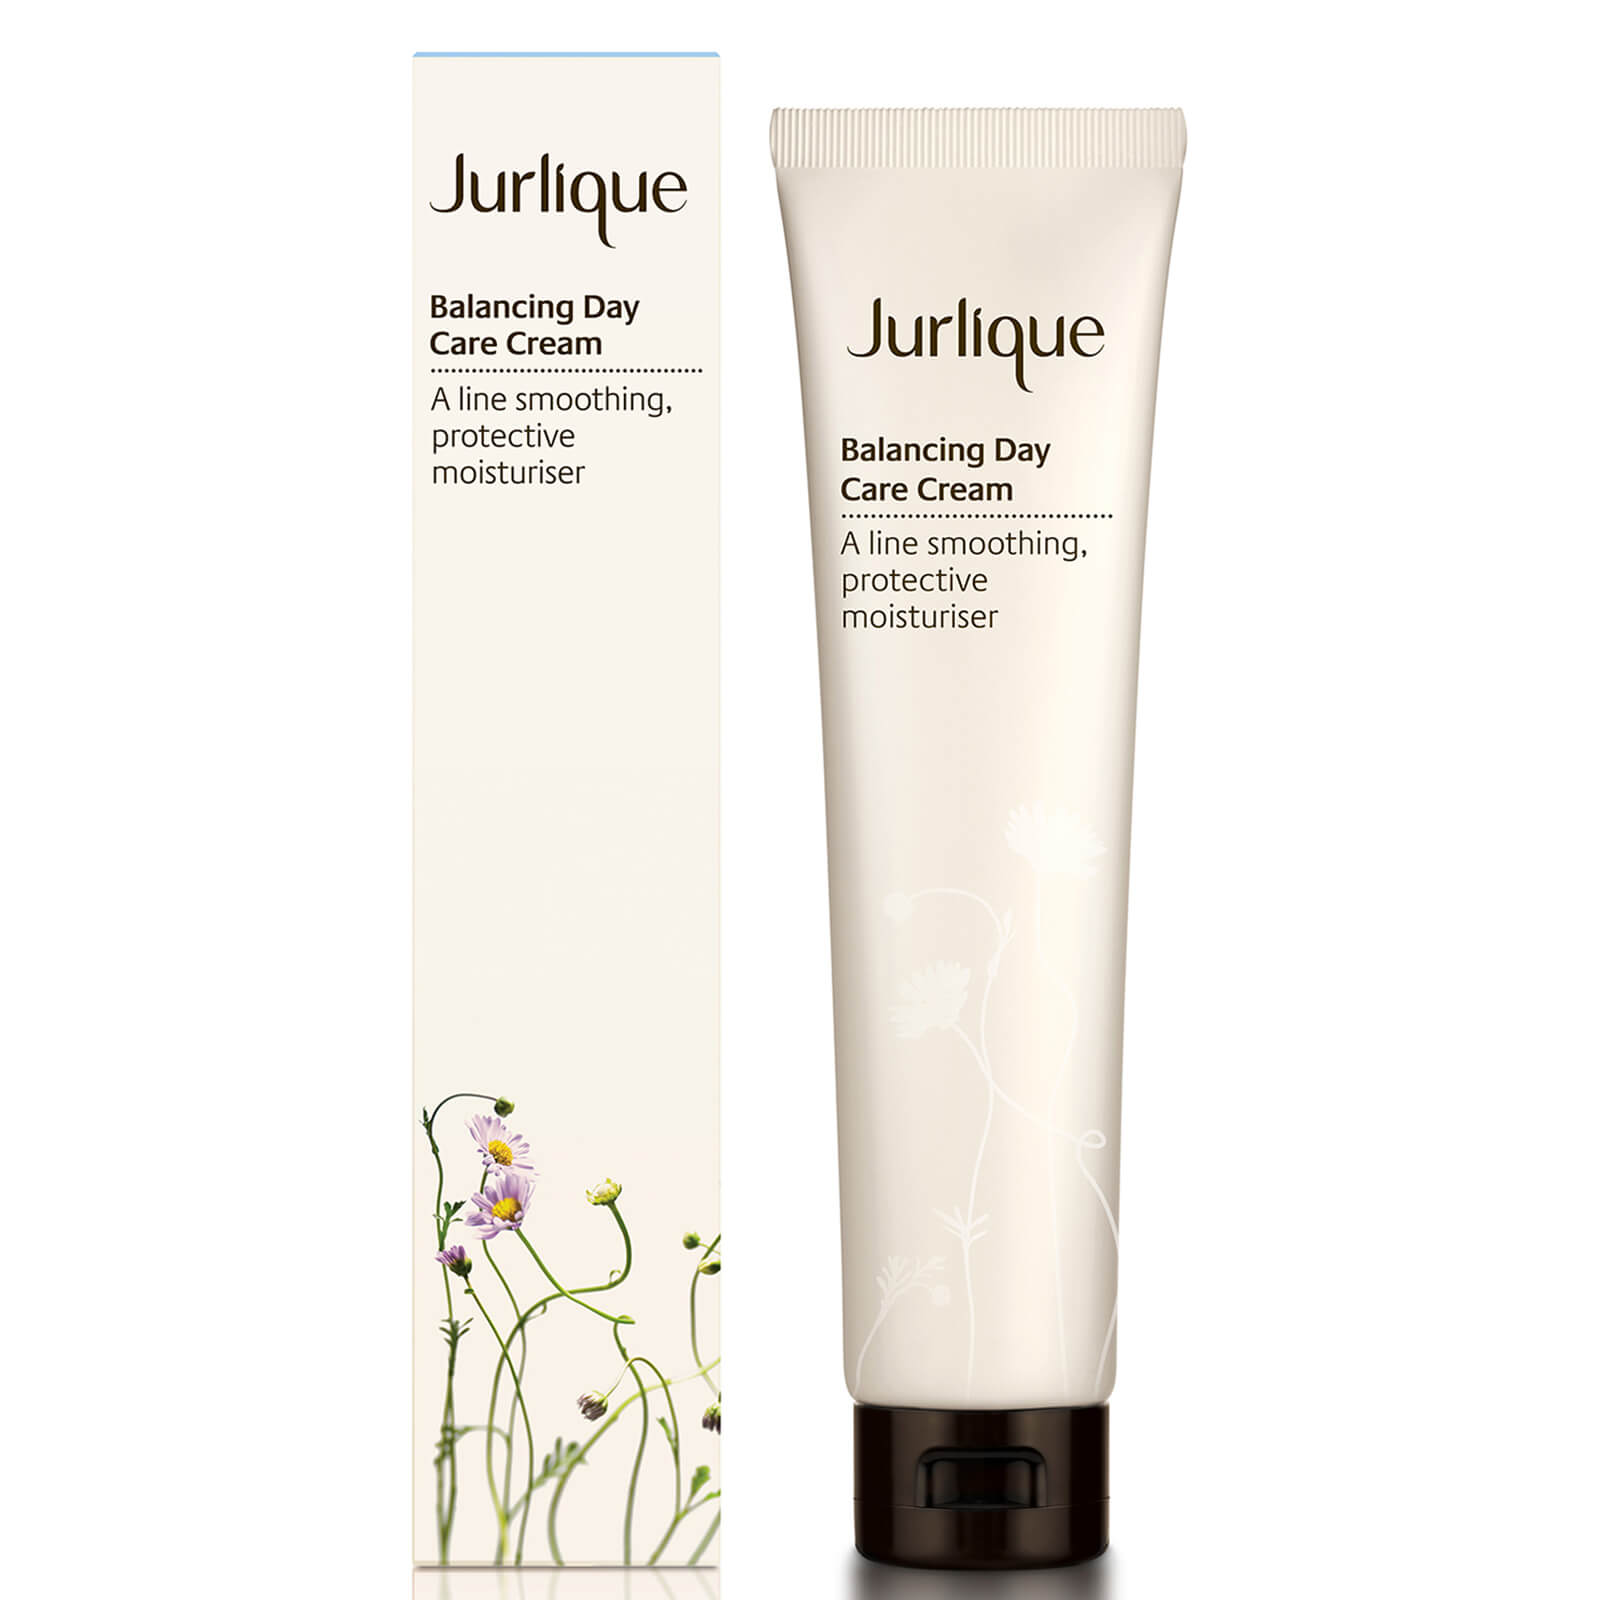 Jurlique Balancing Day Care Cream 40ml Beautyexpert Secret Key Honey Bee Ac Control Mist 100ml For Sensitive Skin